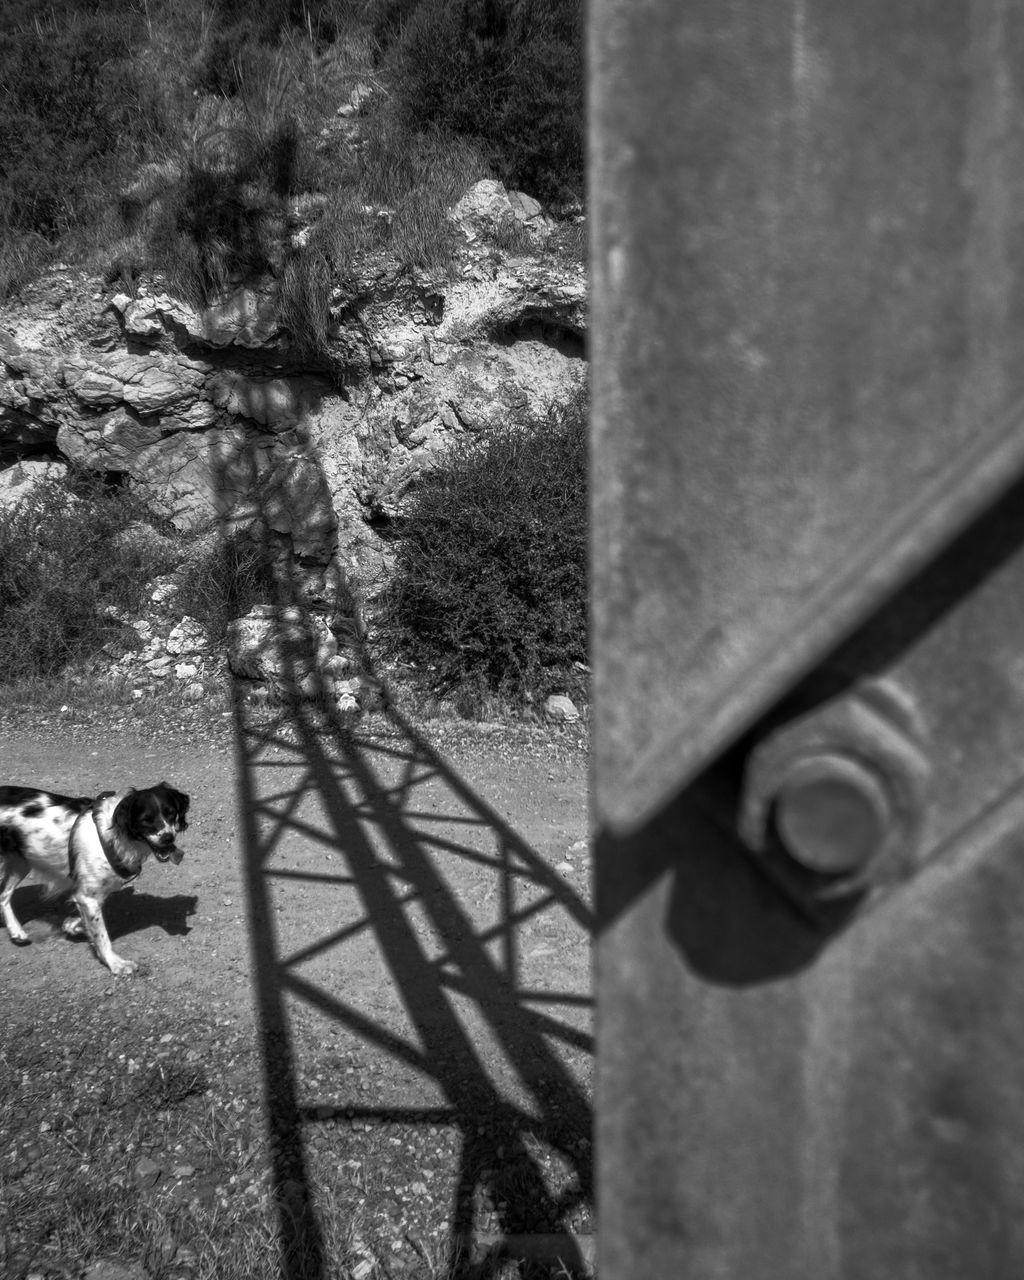 Portrait Of Dog Under Bridge On Sunny Day